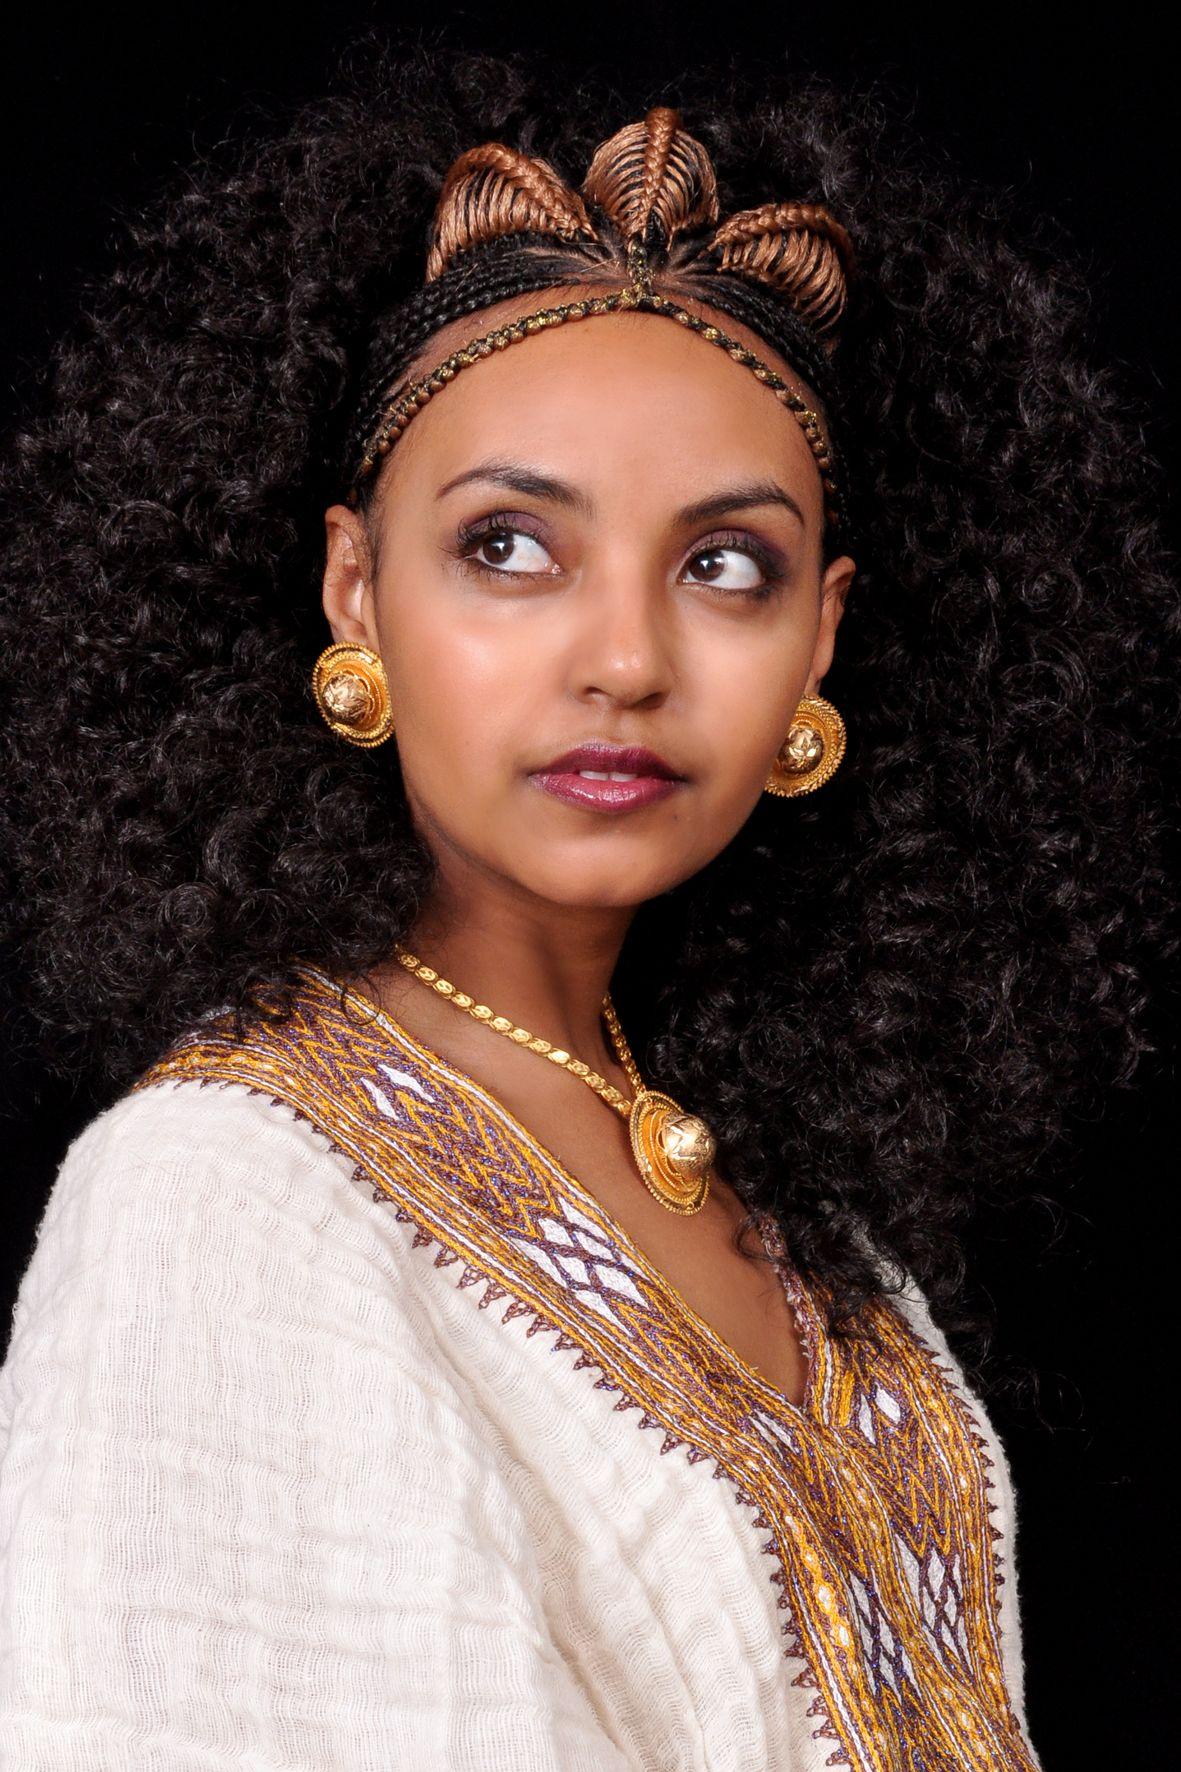 habesha bride cultural hairstyles